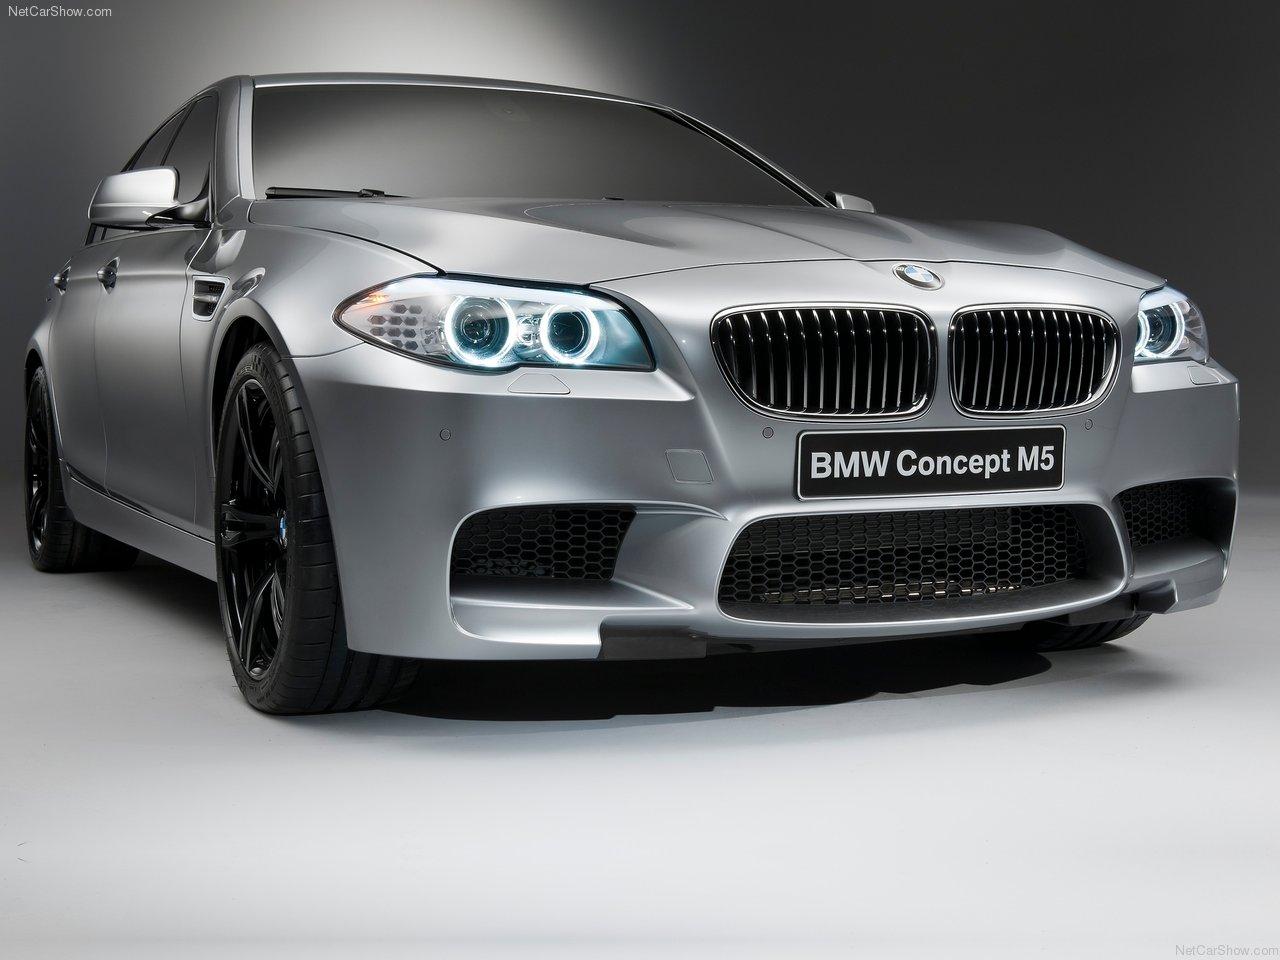 http://4.bp.blogspot.com/-fV_BXuVfpEE/TZolXphtseI/AAAAAAAAENE/YsKFo11r8IY/s1600/BMW-M5_Concept_2011_1280x960_wallpaper_03.jpg